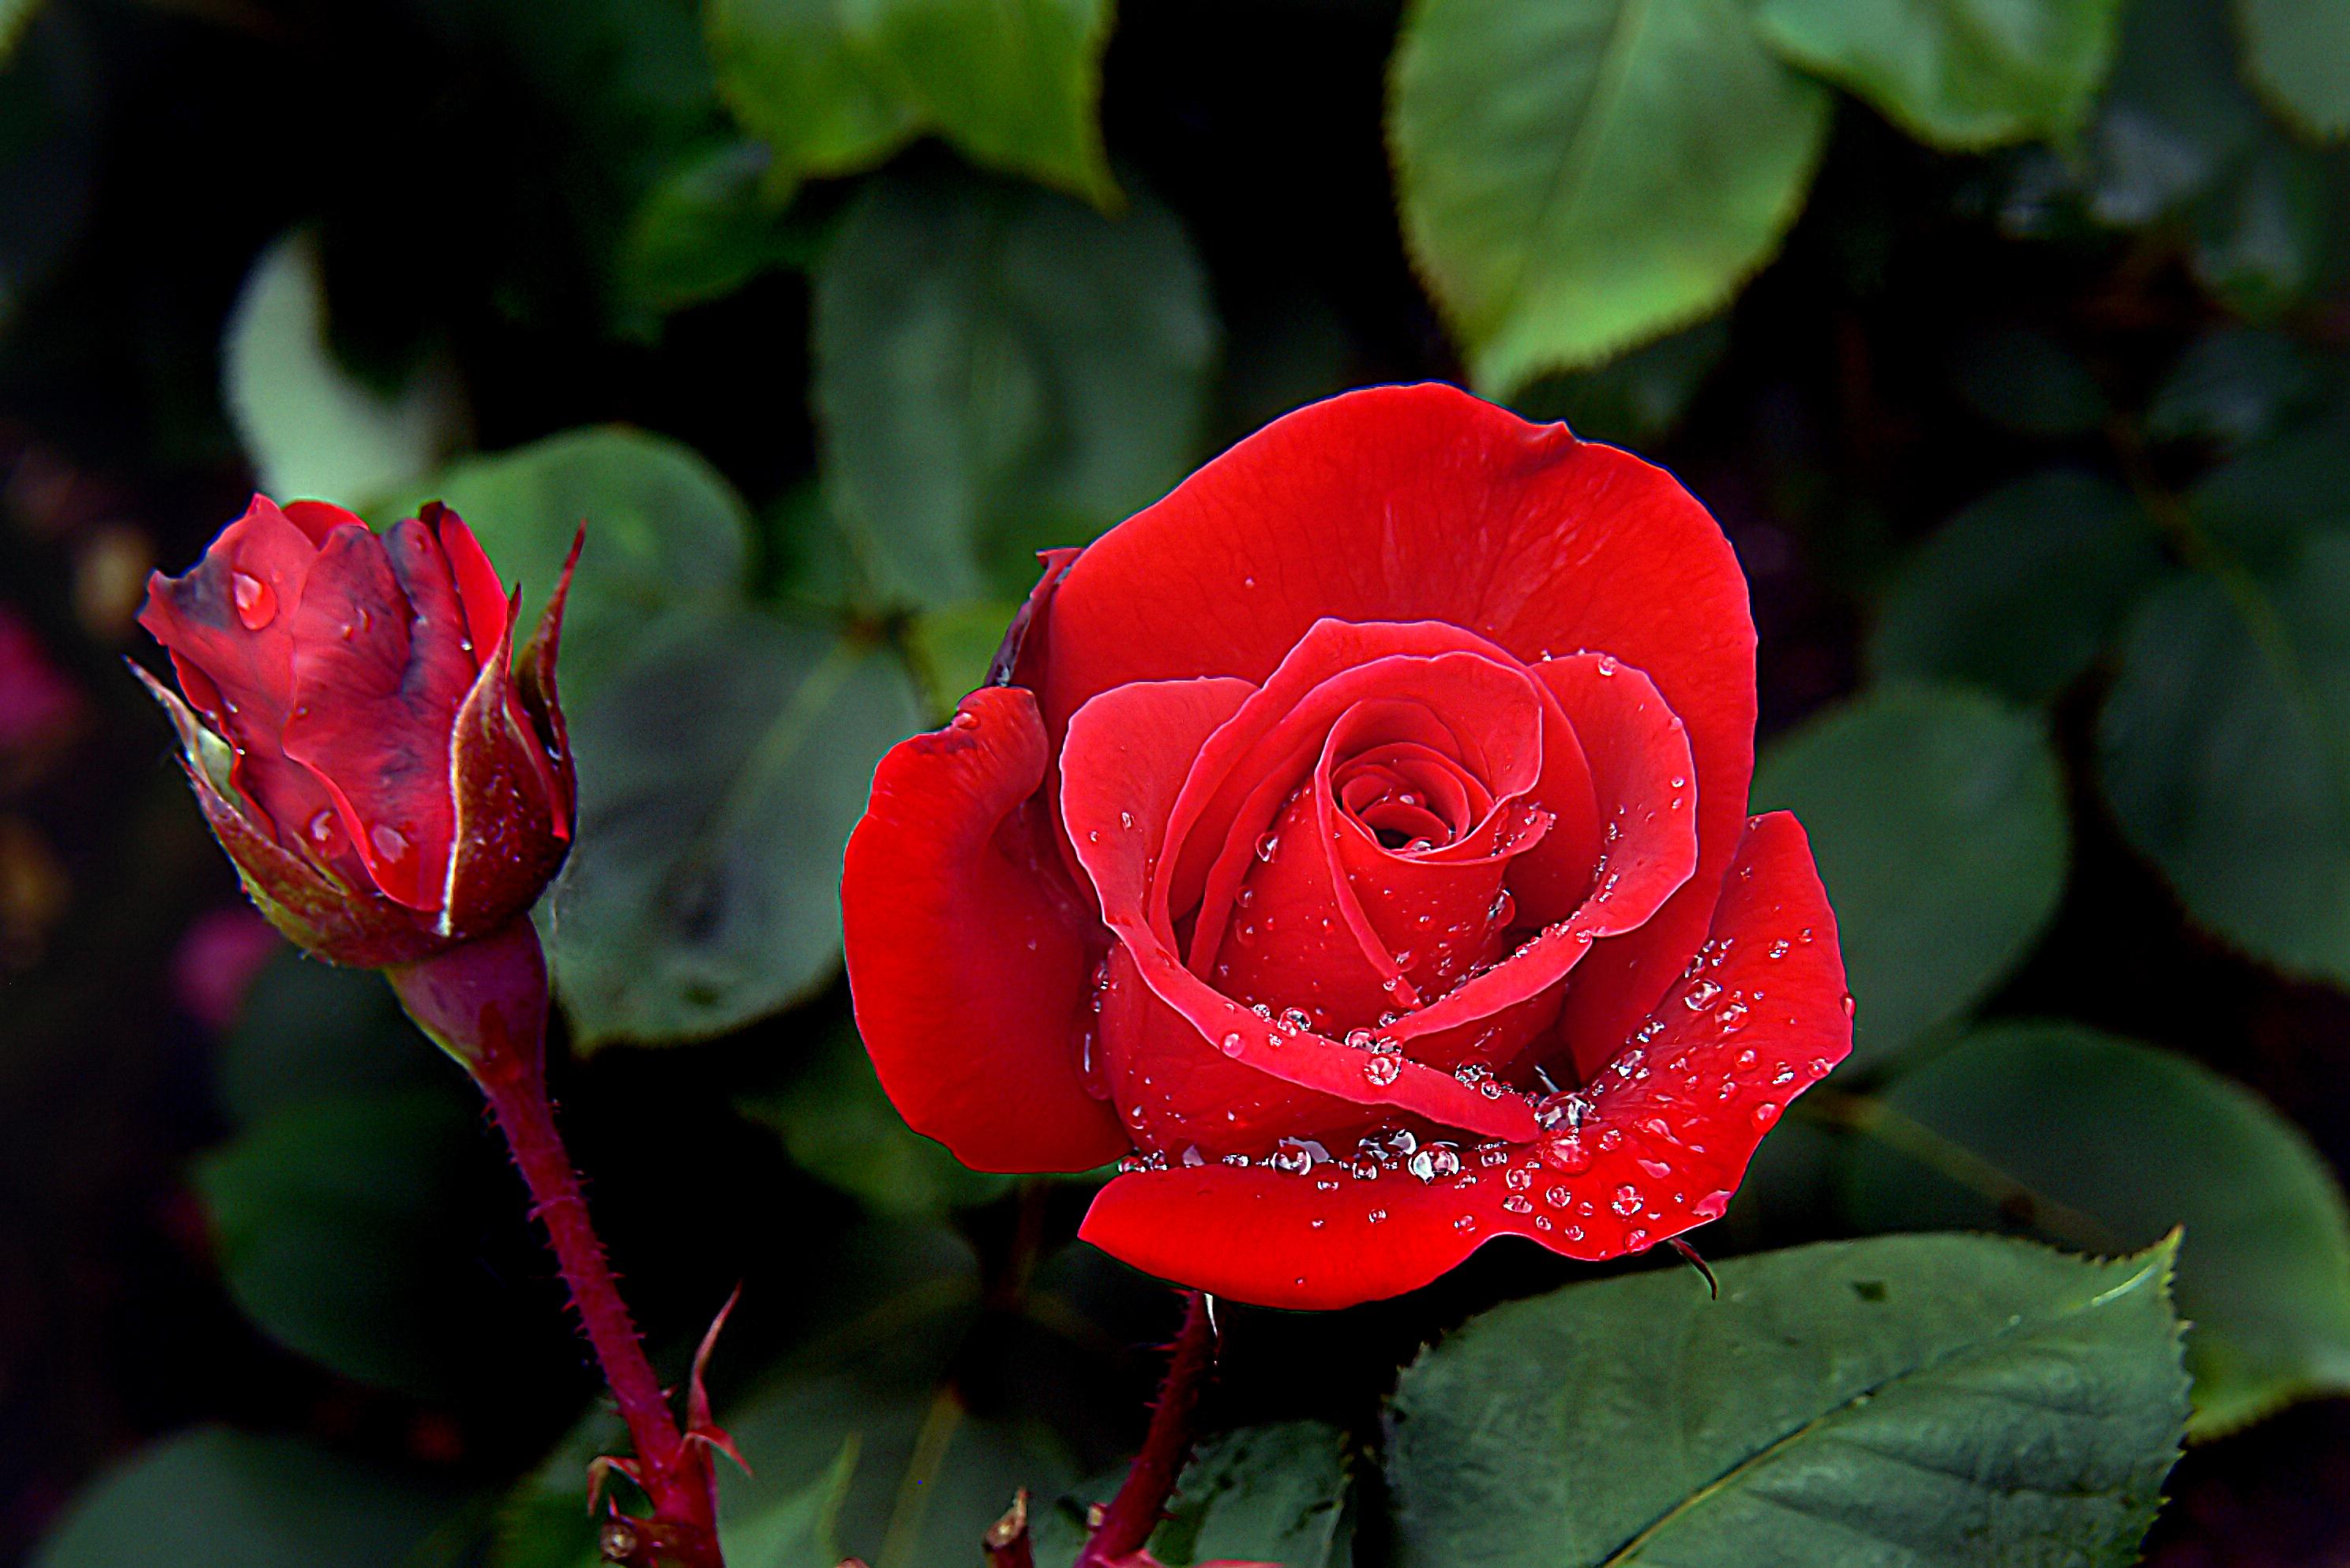 kostenlose foto blatt blume bl tenblatt rot botanik flora blumen rosen publicdomain. Black Bedroom Furniture Sets. Home Design Ideas